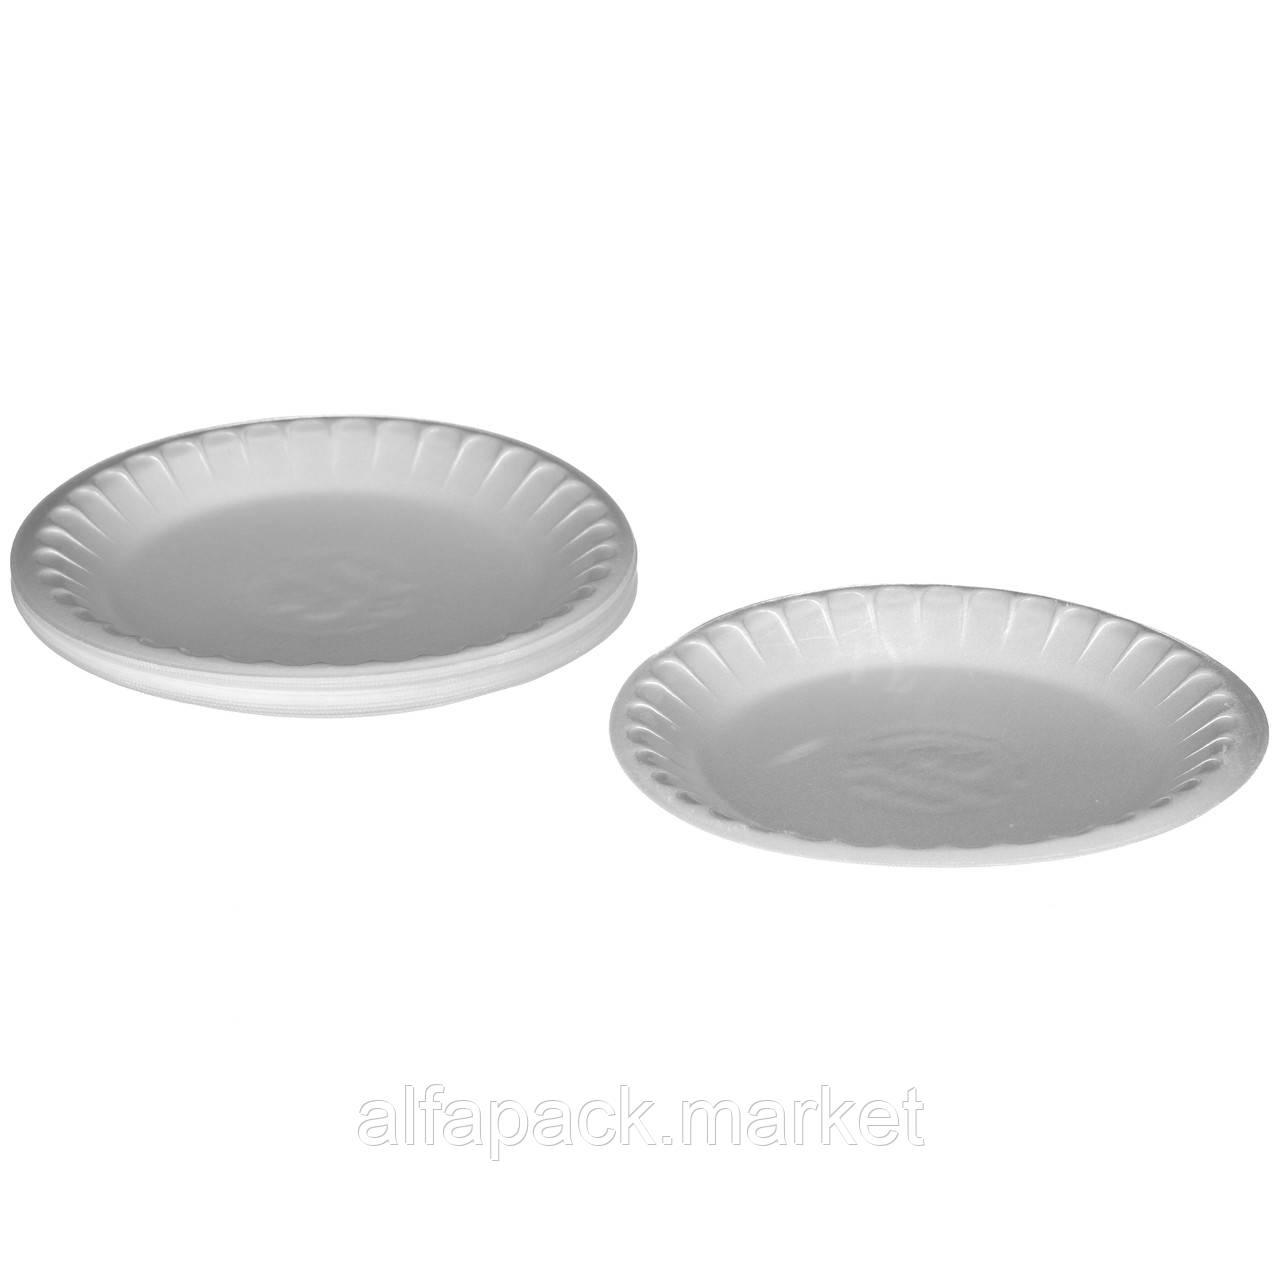 Набор одноразовых тарелок Food Packing Тарелка банкетная 225 мм 10 персон 000002426